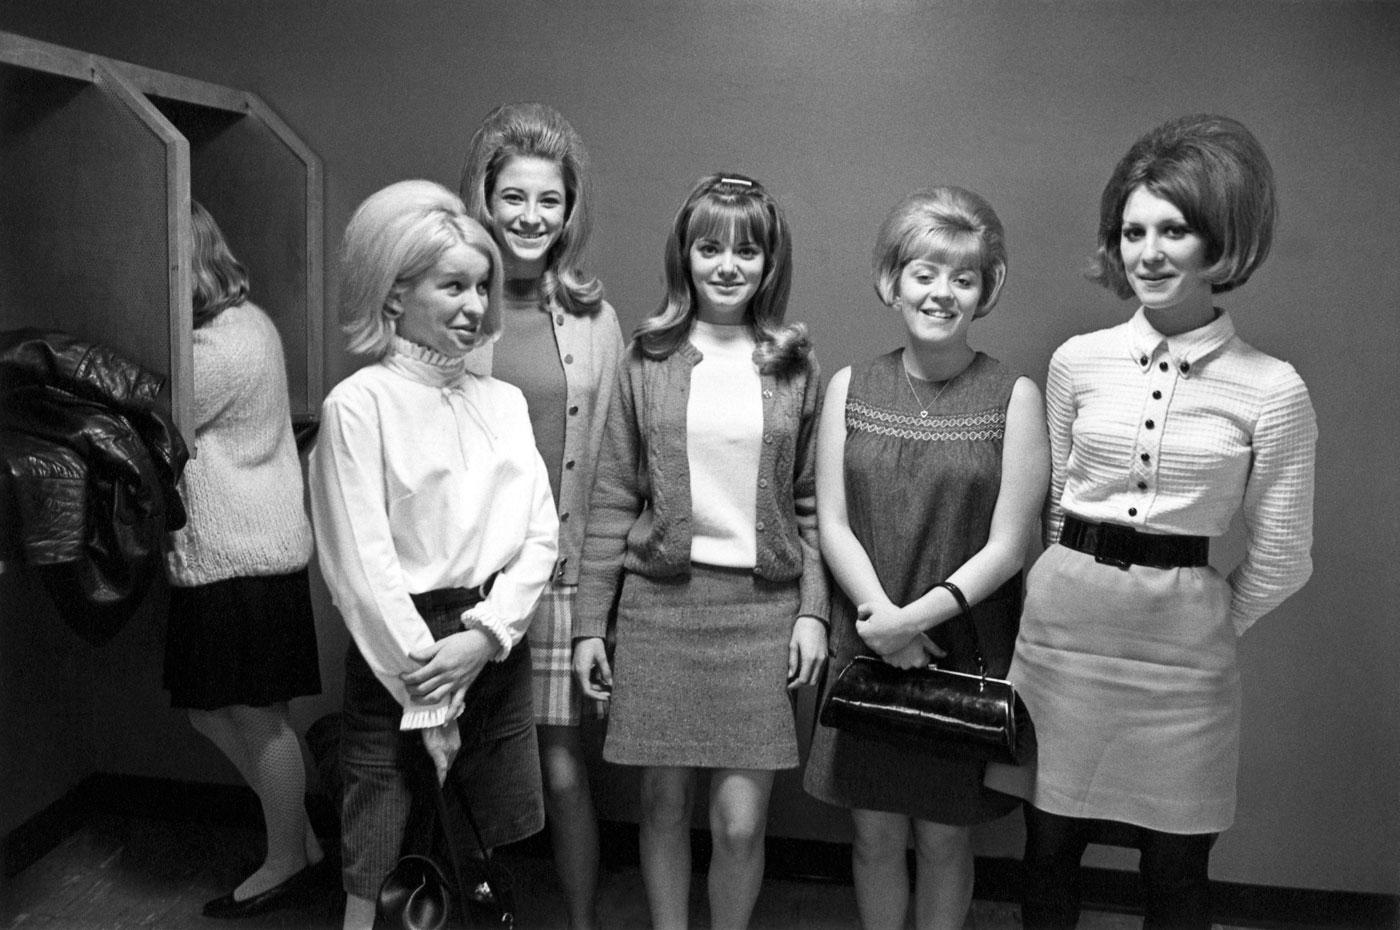 Detroit 1968 Photographs By Enrico Natali